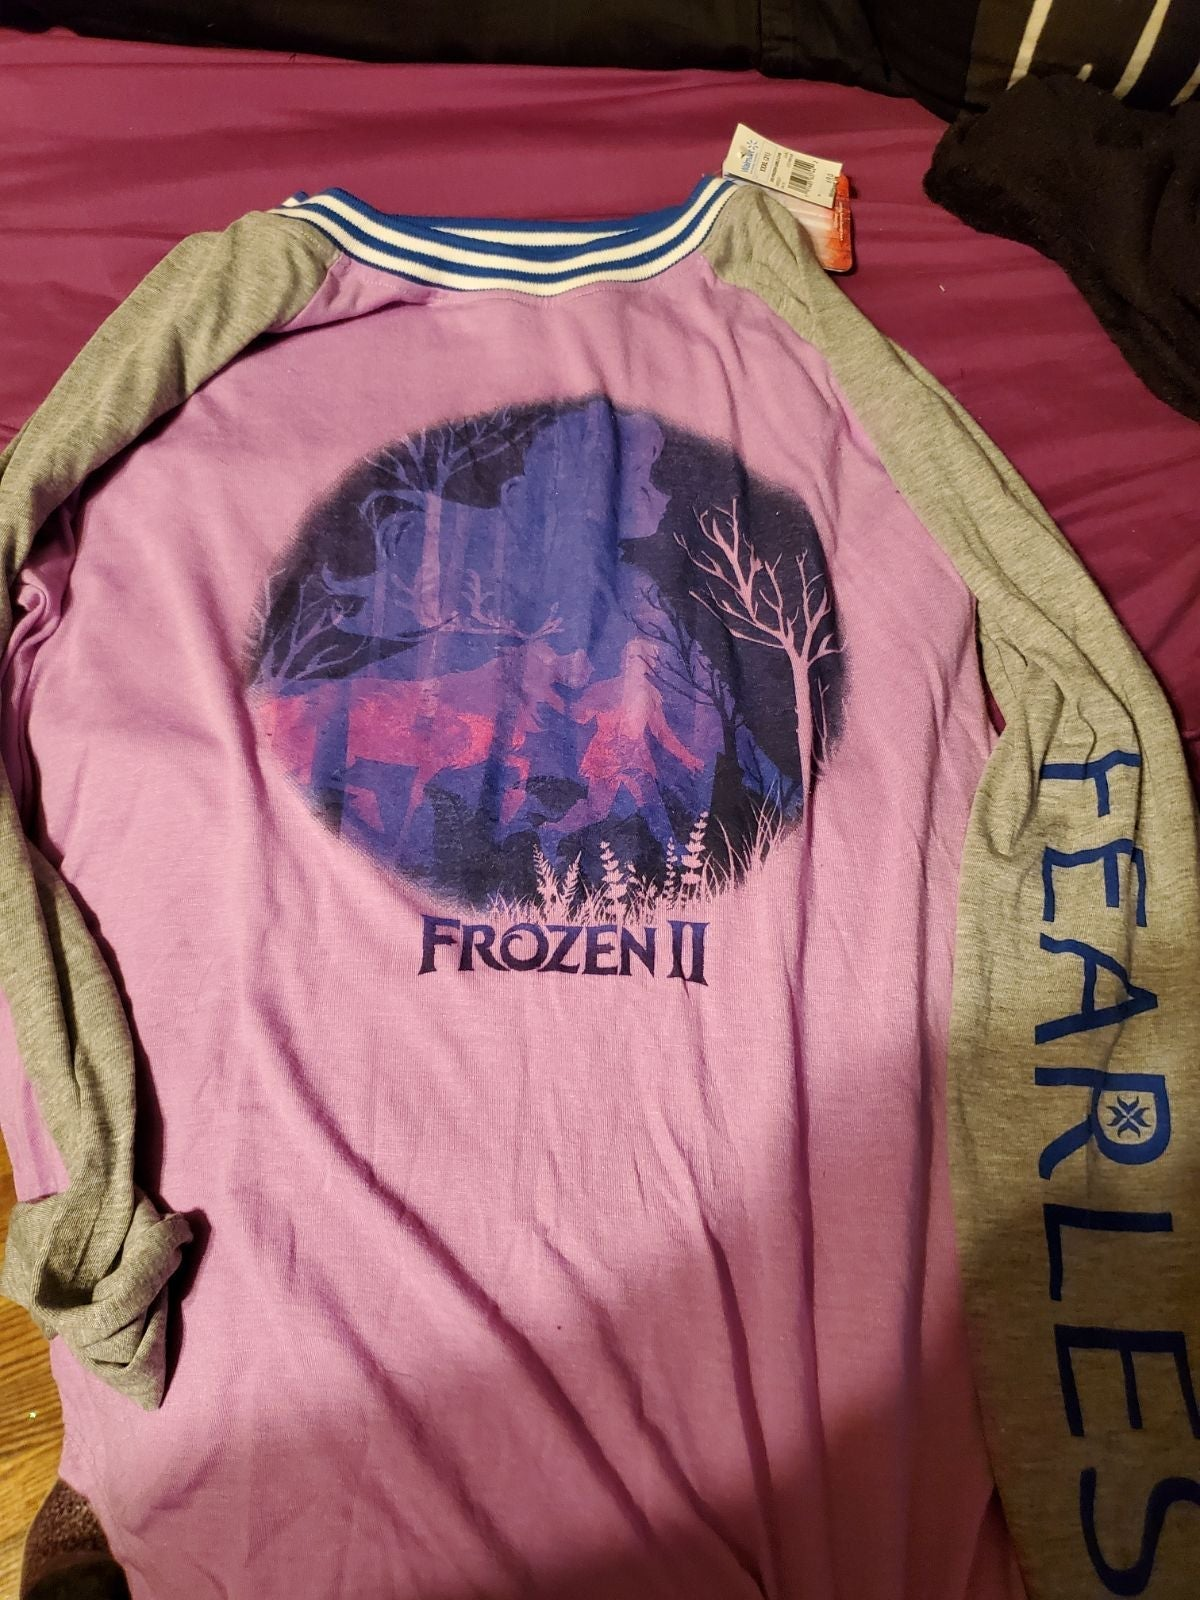 Frozen tshirt